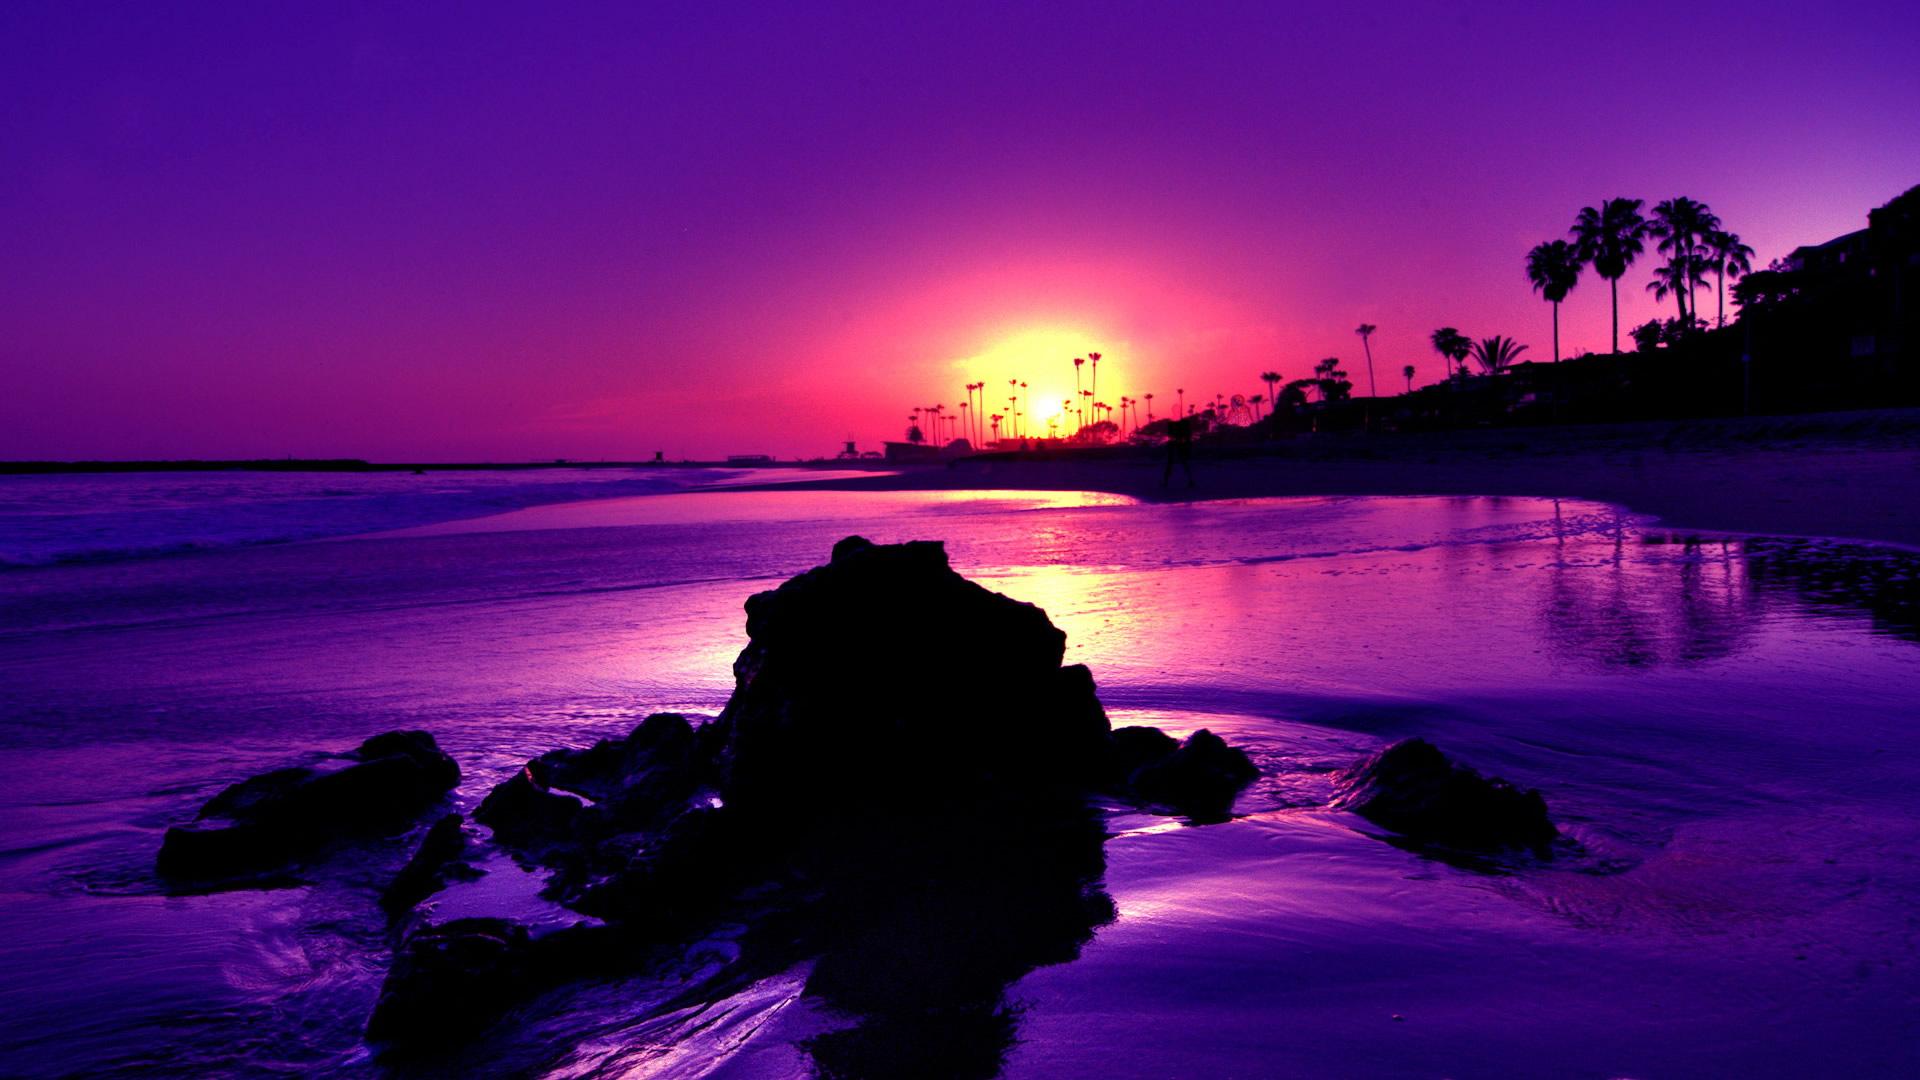 Amazing Purple Sunset Beach High Definition Wallpaper